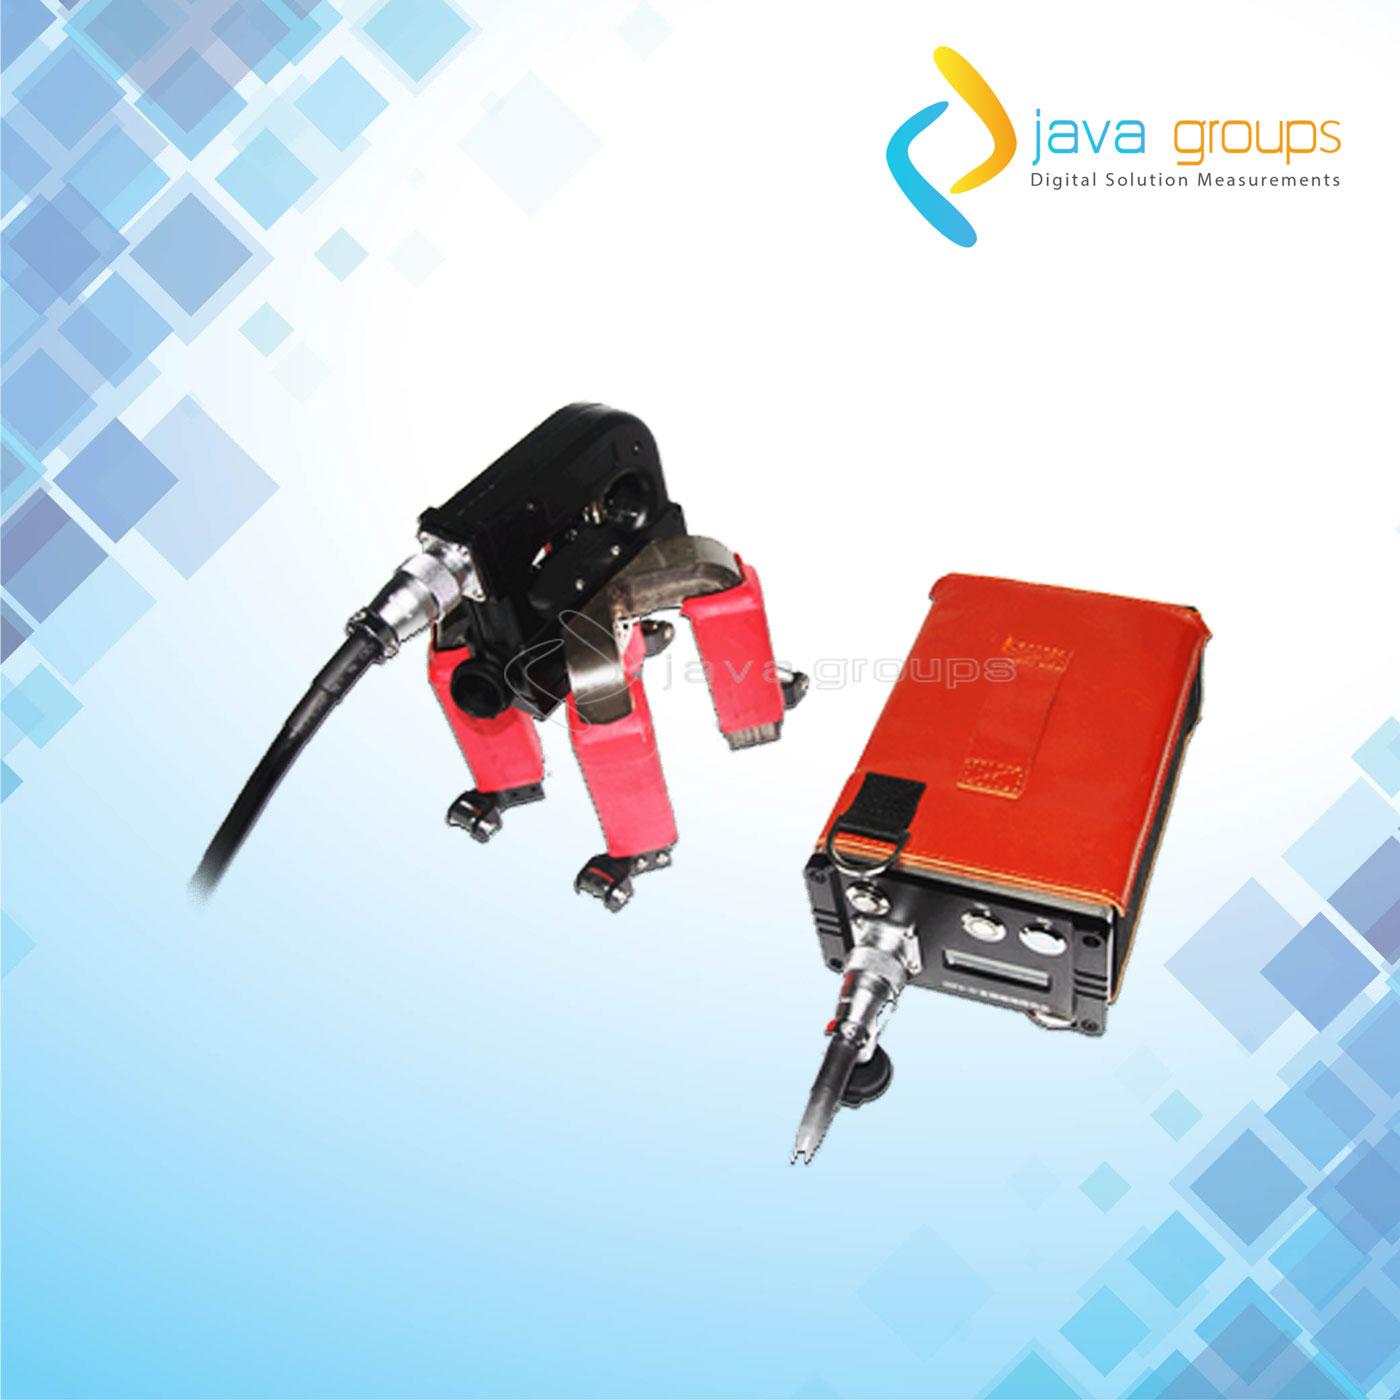 Alat Pengukur Kecacatan Flaw Detector Mitech MT-2X